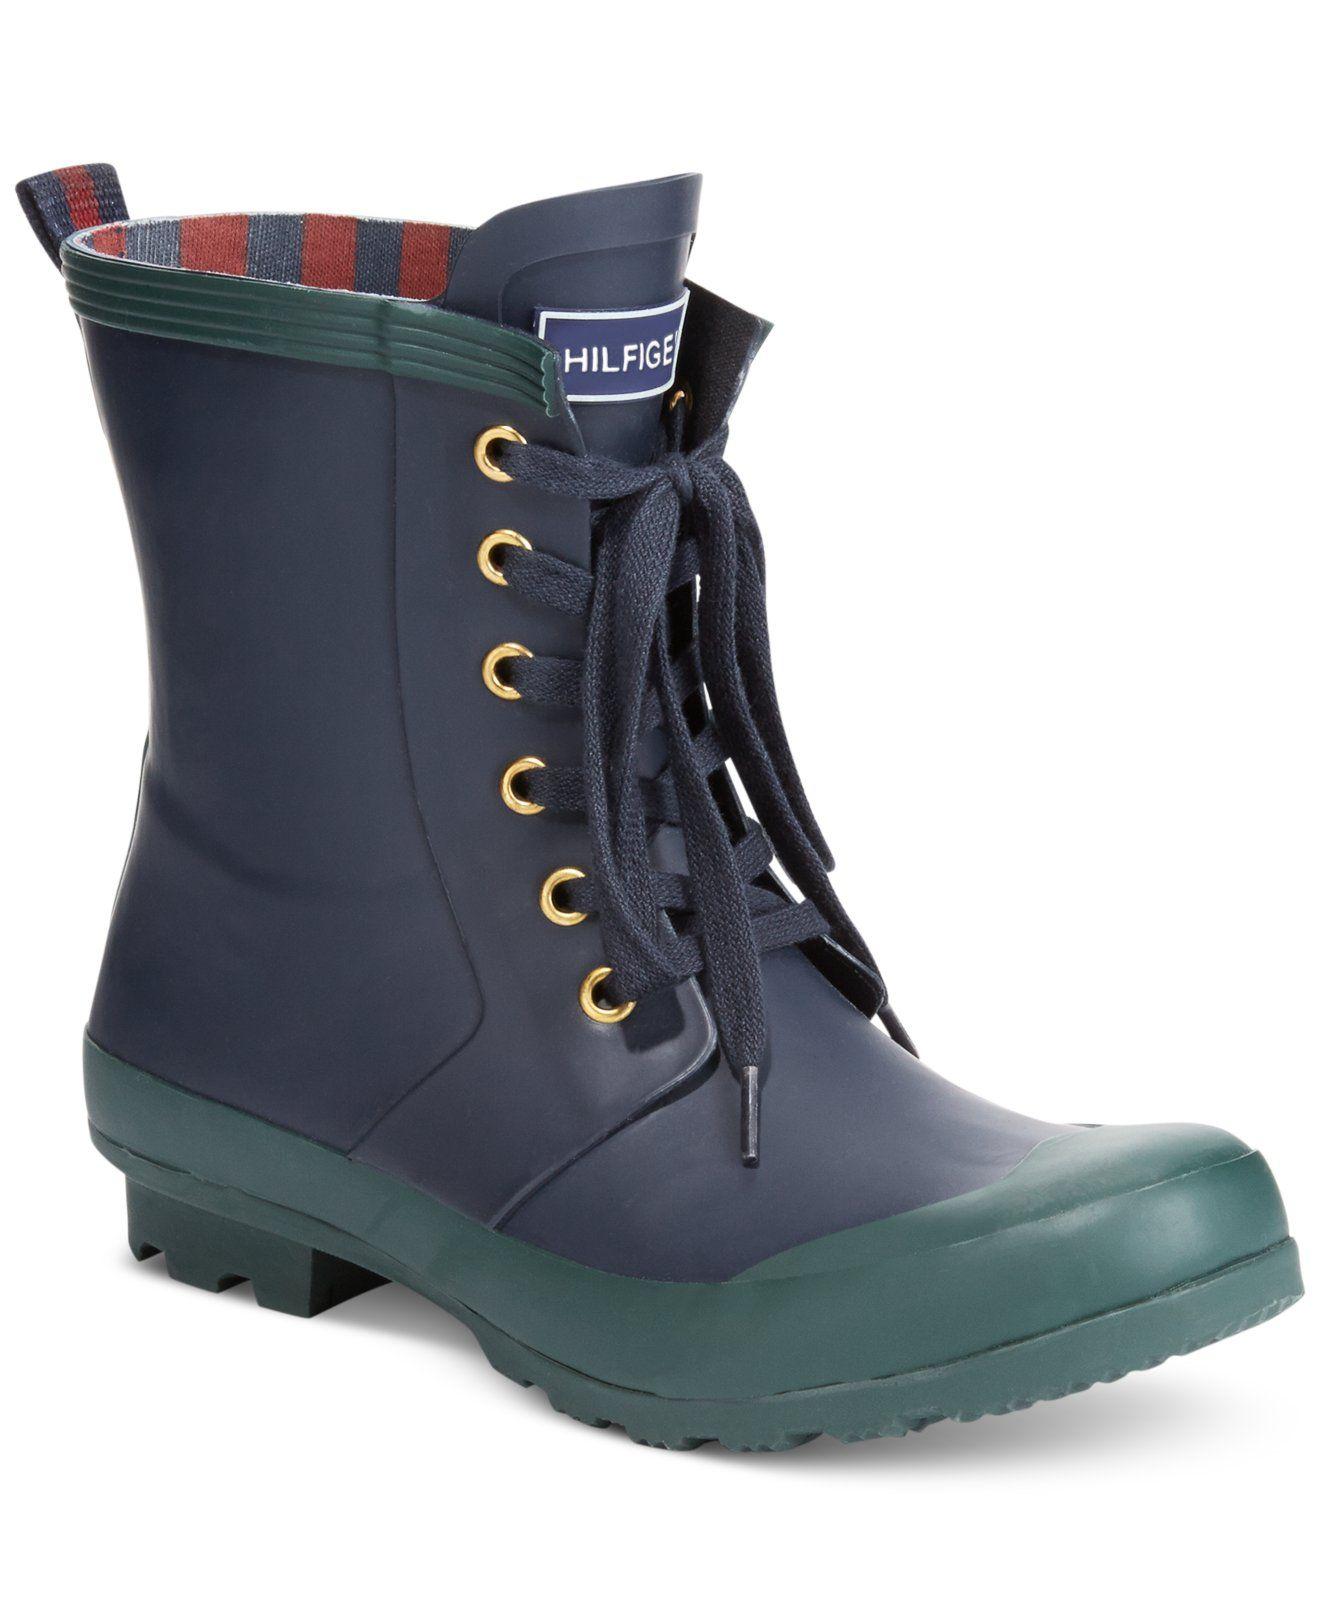 214c69e6221e Tommy Hilfiger Renegade Rain Booties - Winter   Rain Boots - Shoes - Macy s